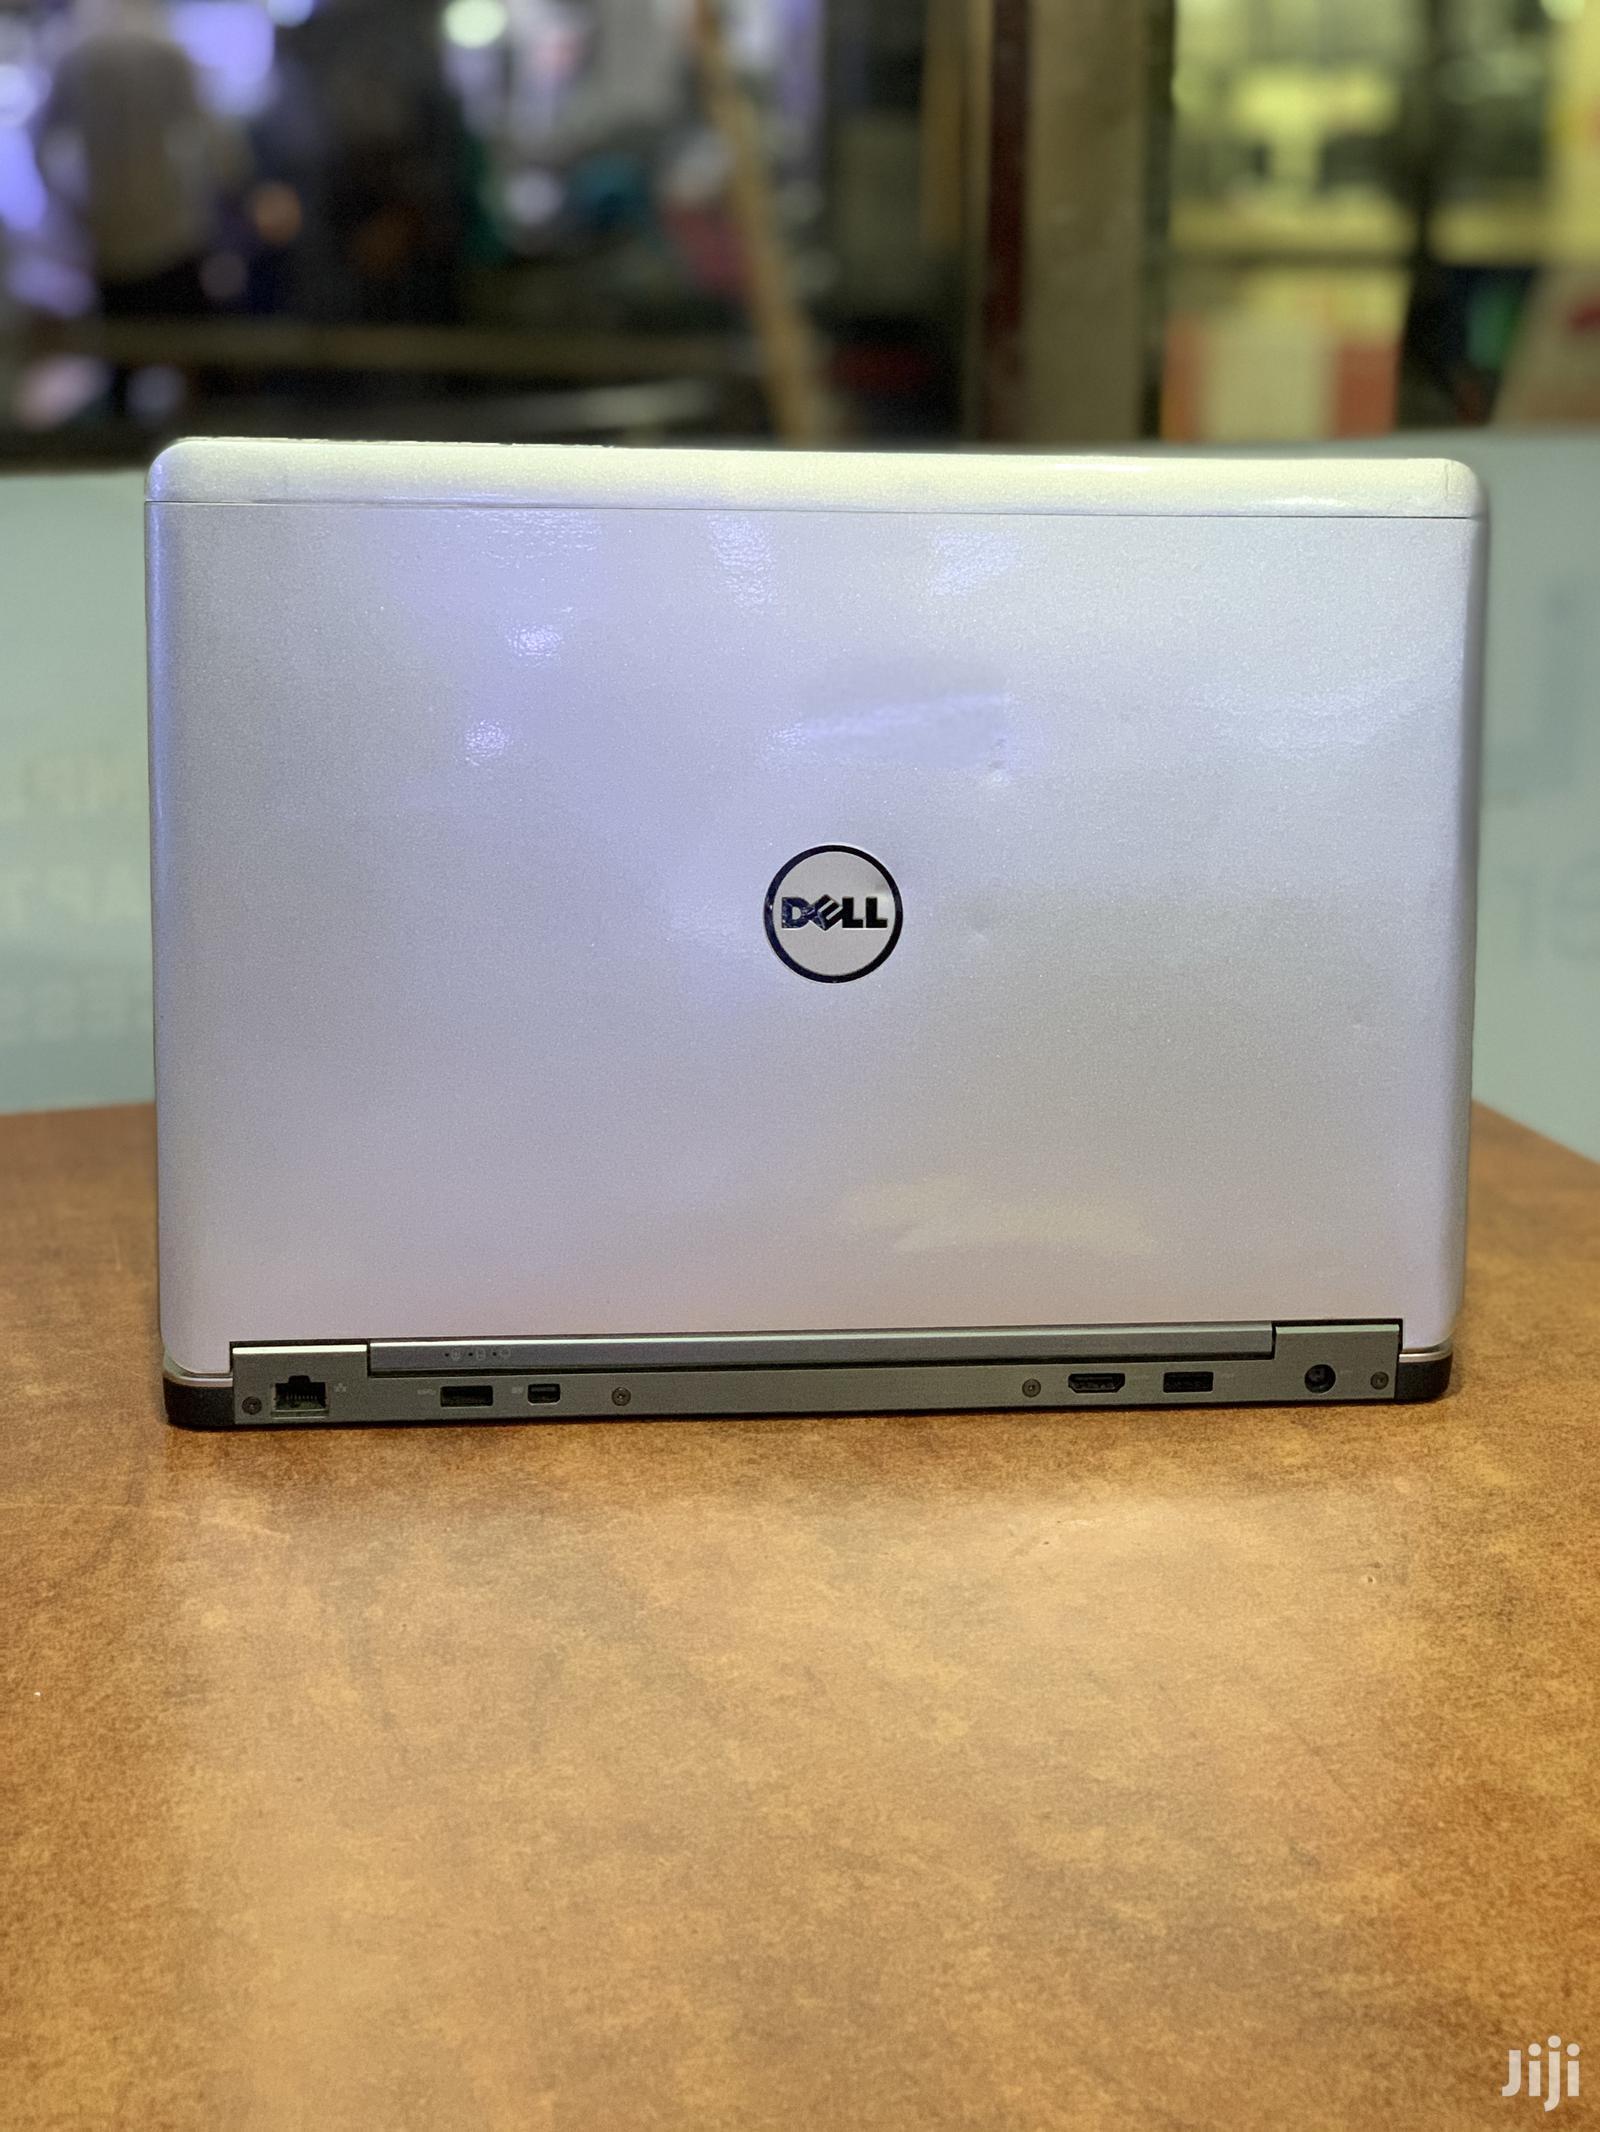 Laptop Dell Latitude E7450 8GB Intel Core I5 HDD 500GB | Laptops & Computers for sale in Kampala, Central Region, Uganda